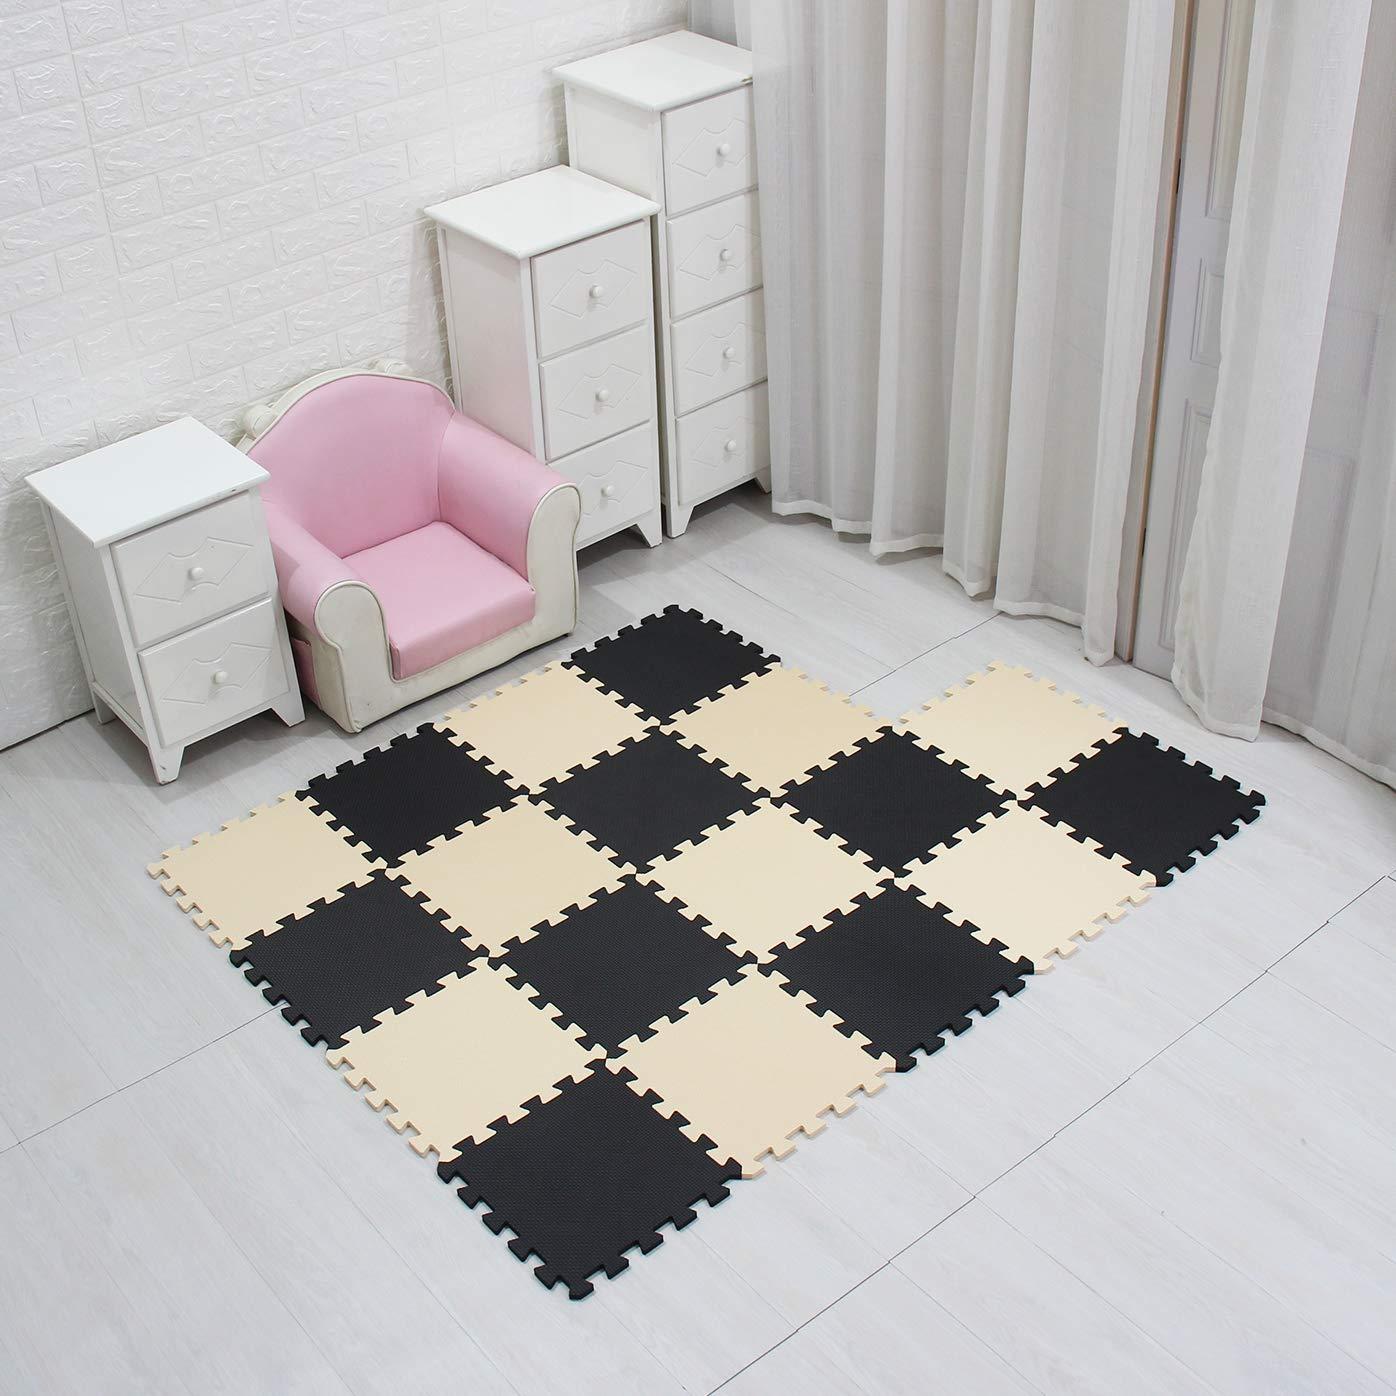 MQIAOHAM Children Puzzle mat Play mat Squares Play mat Tiles Baby mats for Floor Puzzle mat Soft Play mats Girl playmat Carpet Interlocking Foam Floor mats for Baby Black Beige 104110